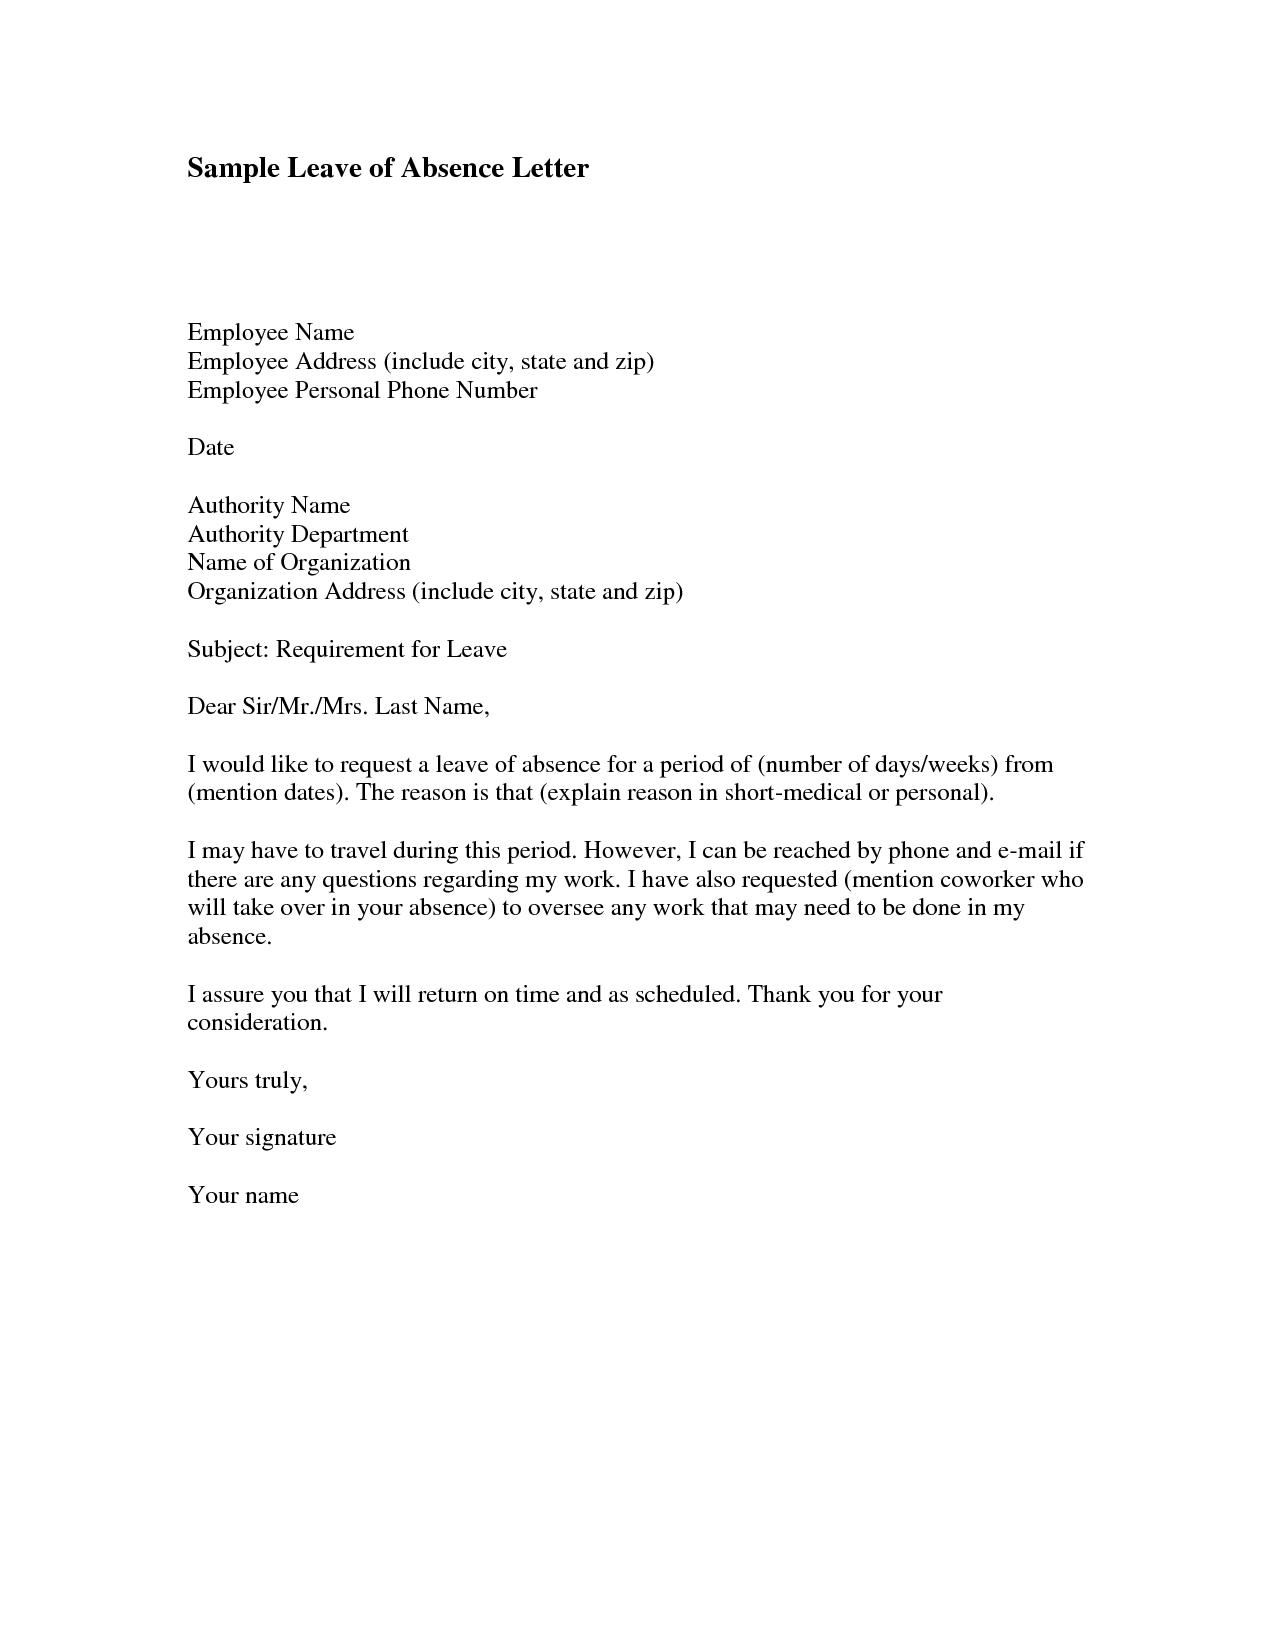 Letter Of Absence To Work Letter Of Absence To Work